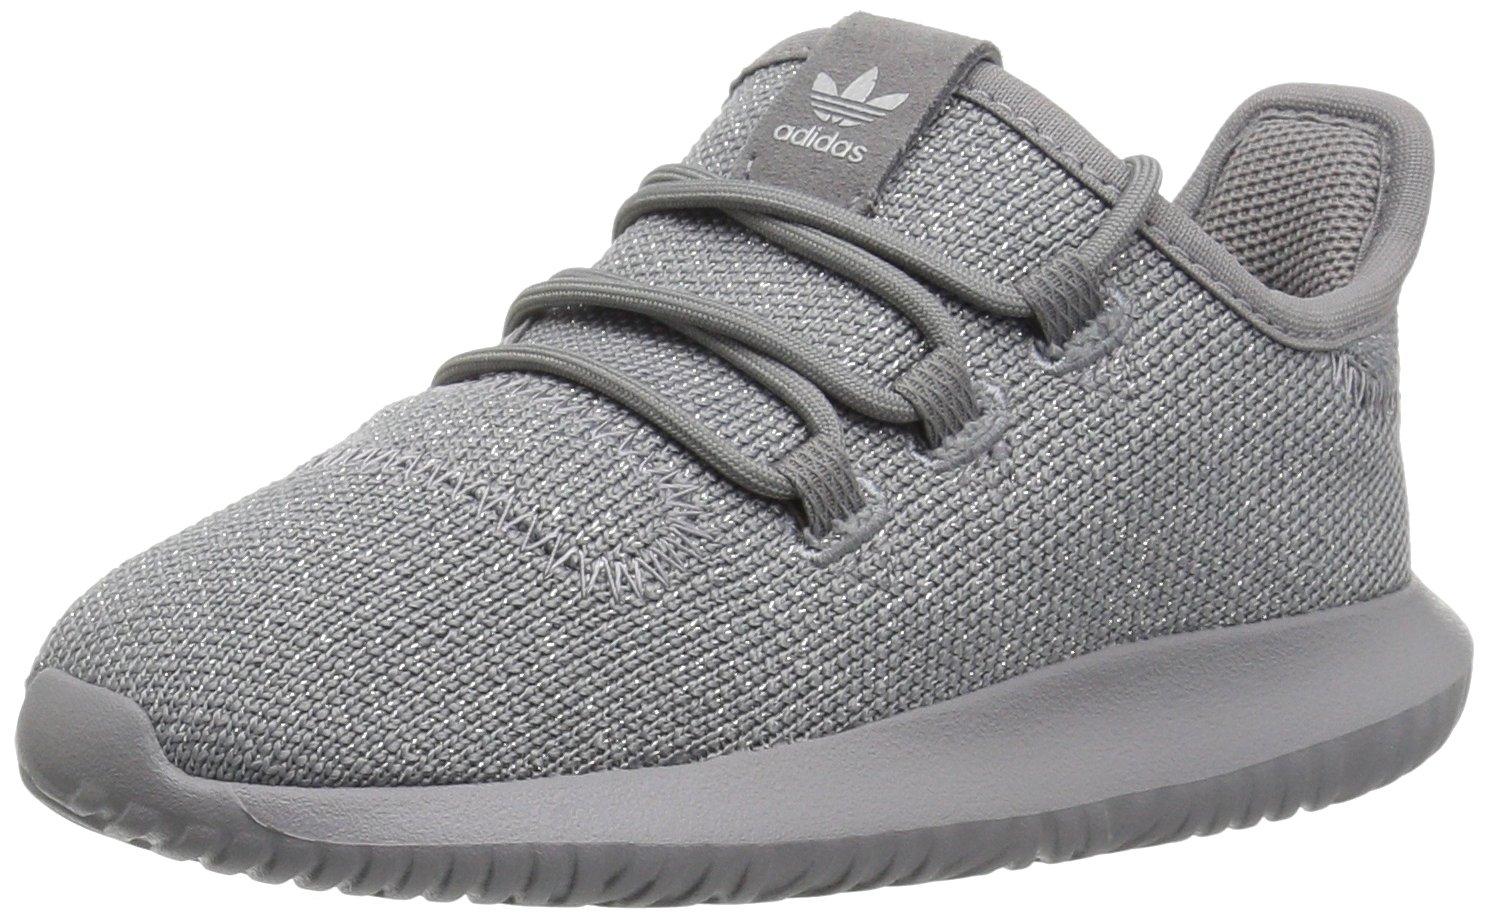 size 40 de116 afc02 adidas Originals Boys' Tubular Shadow Running Shoe, Grey Three/Metallic  Silver, 8 M US Toddler